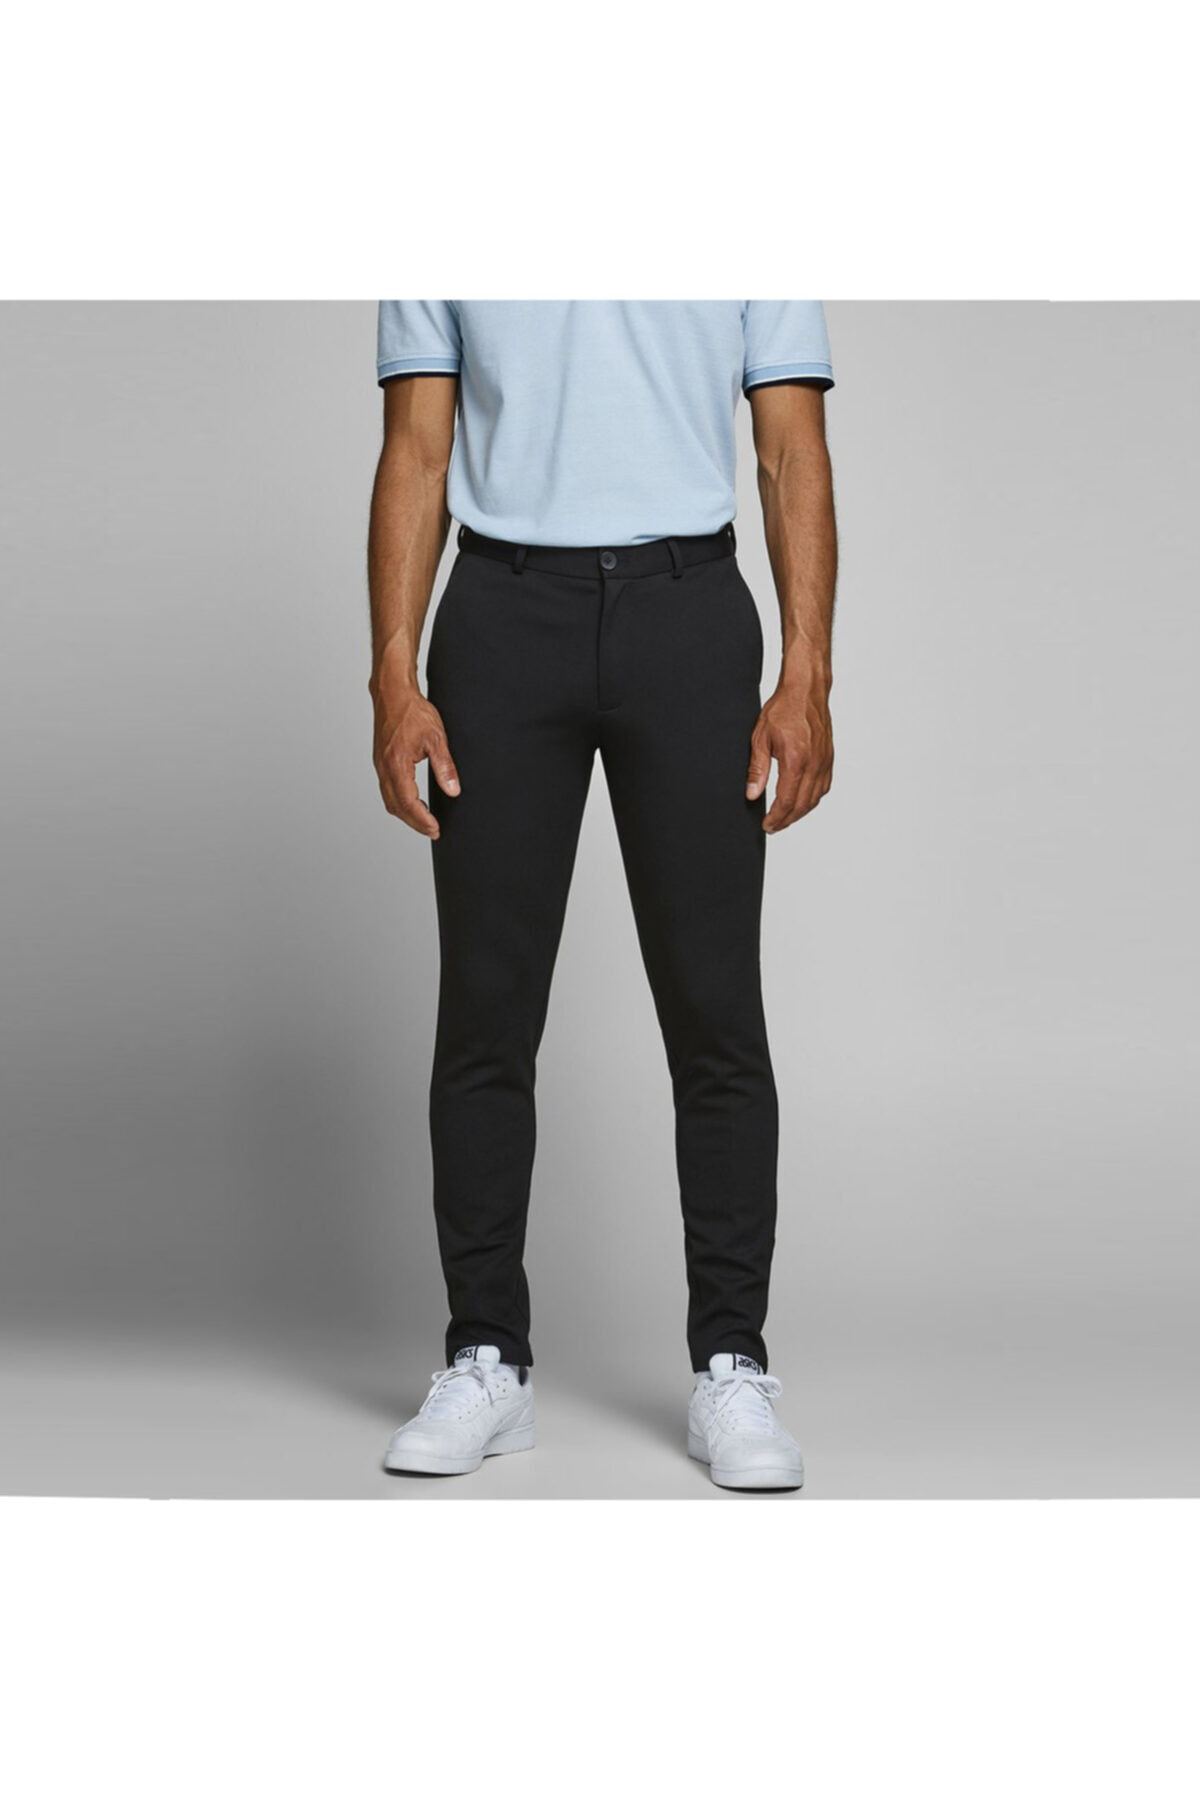 Jack & Jones Erkek Siyah Dar Paça Pantolon 12173623-b 1